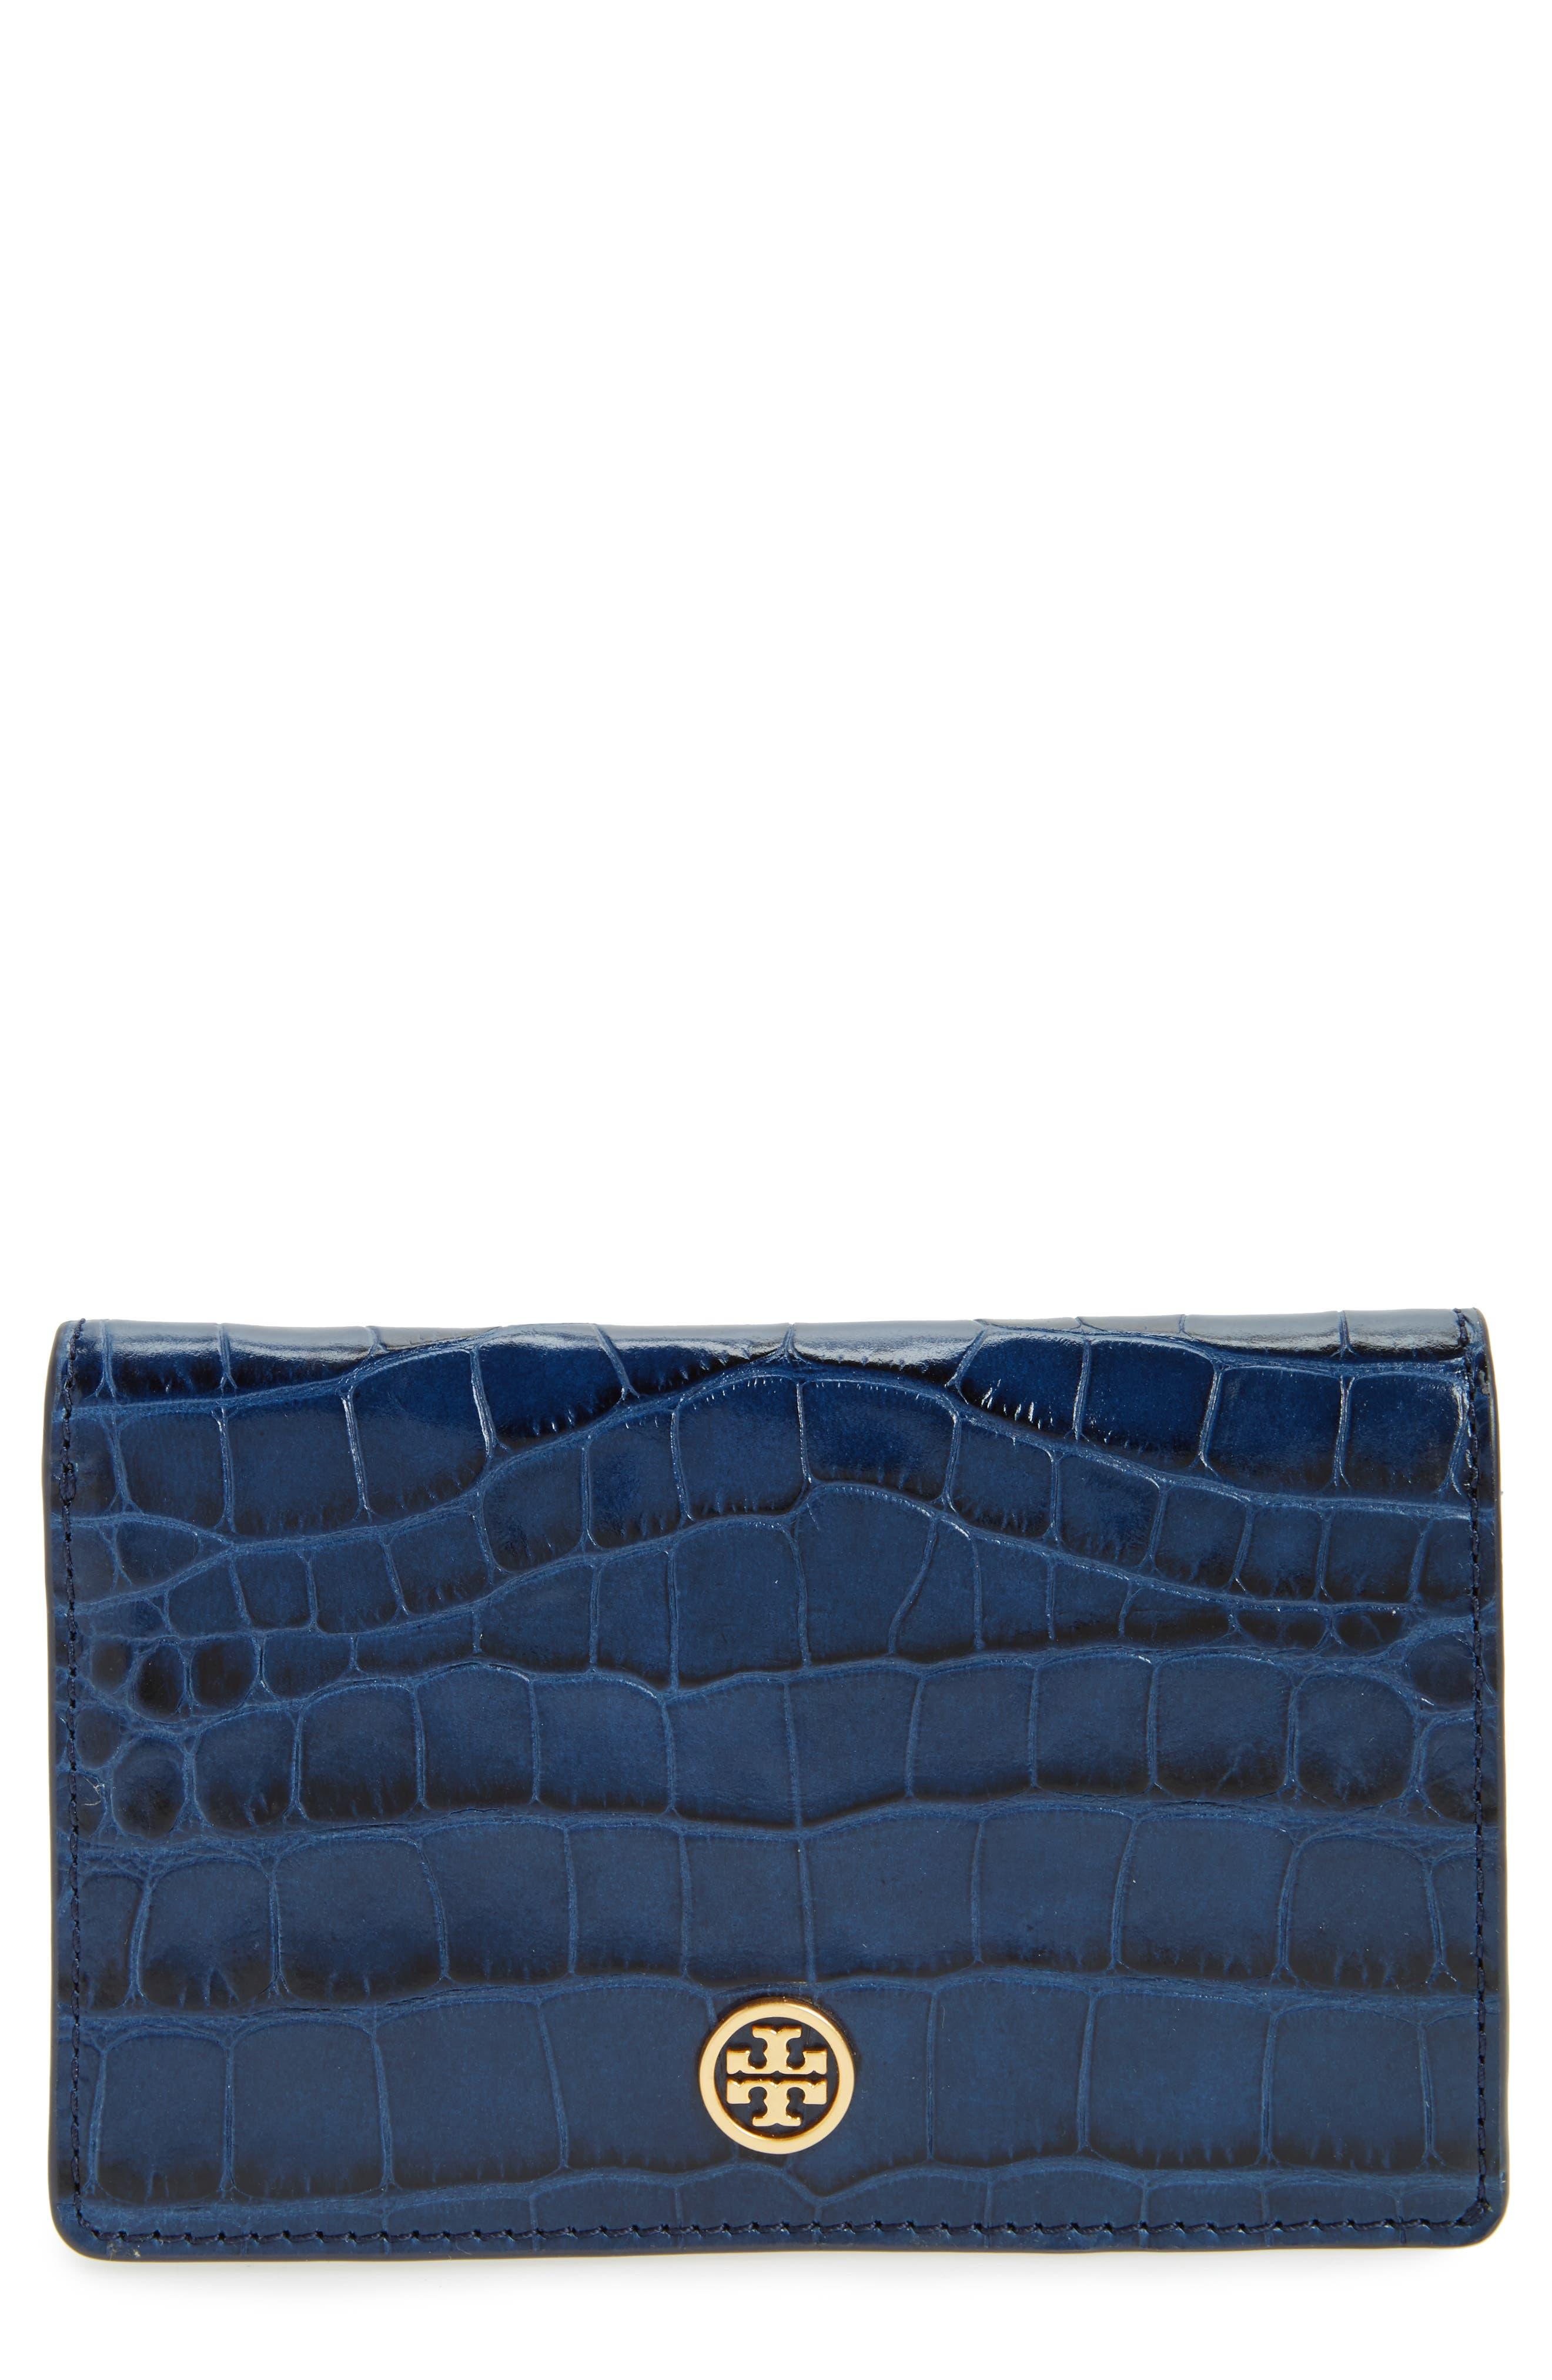 Parker Slim Croc Embossed Leather Wallet,                             Main thumbnail 1, color,                             486